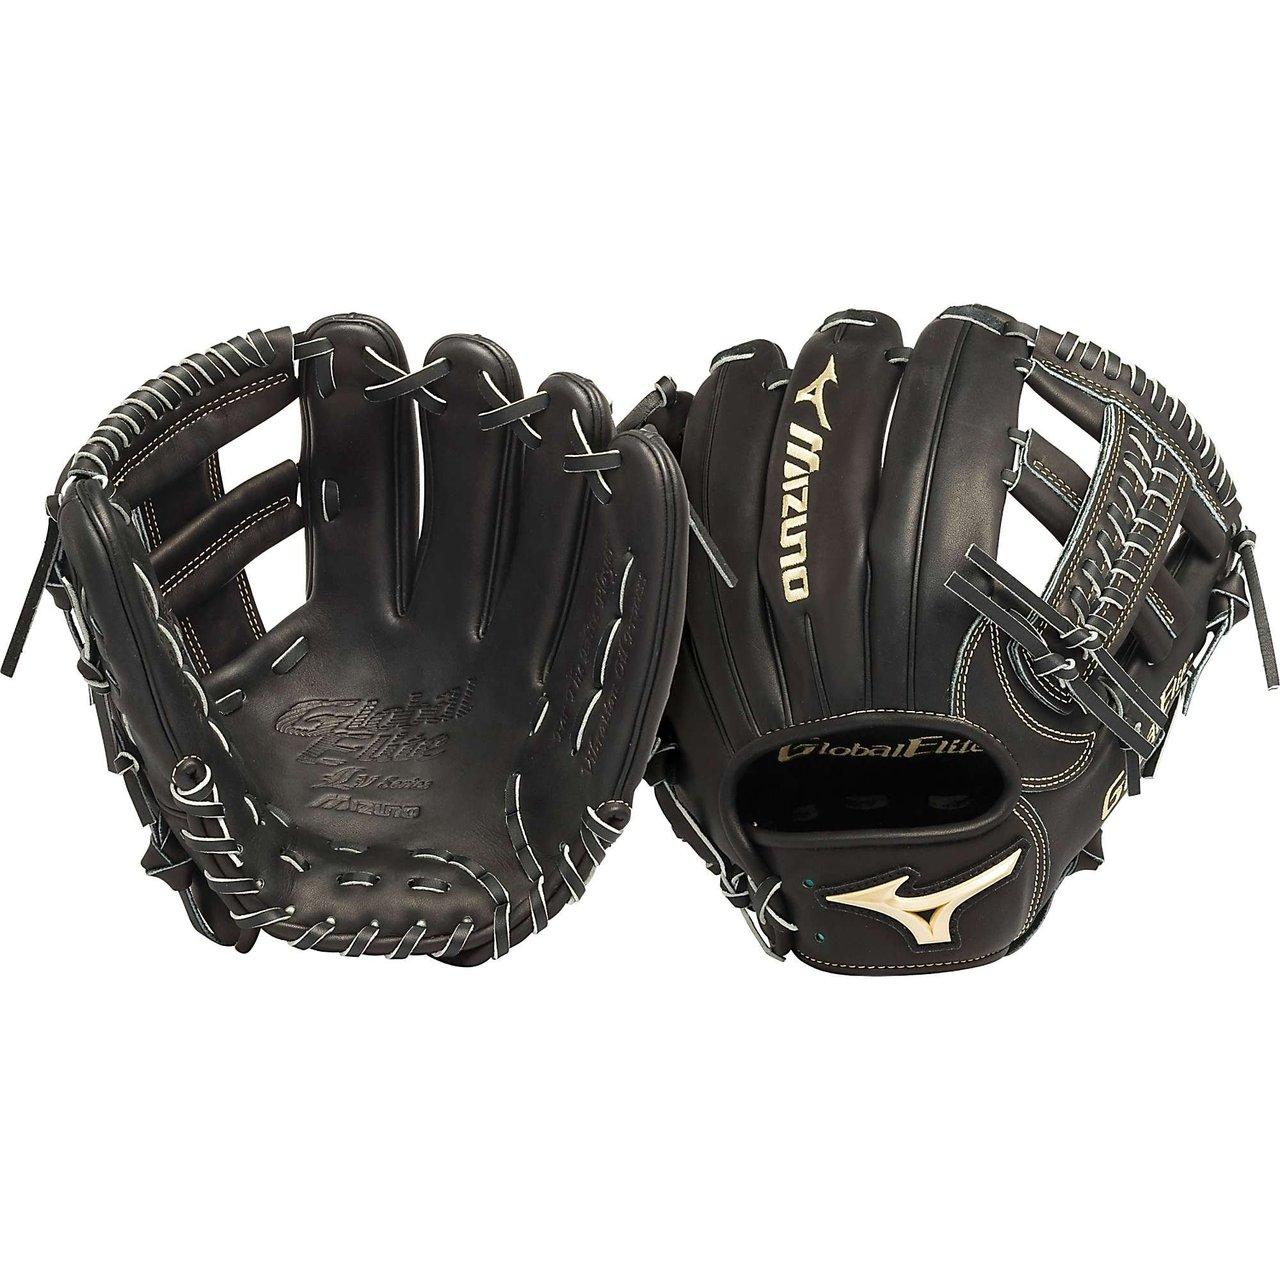 mizuno-gge61vbk-global-elite-vop-11-5-in-infield-baseball-glove-right-handed-throw GGE61VBK-Right Handed Throw Mizuno New Mizuno GGE61VBK Global Elite VOP 11.5 in Infield Baseball Glove Right